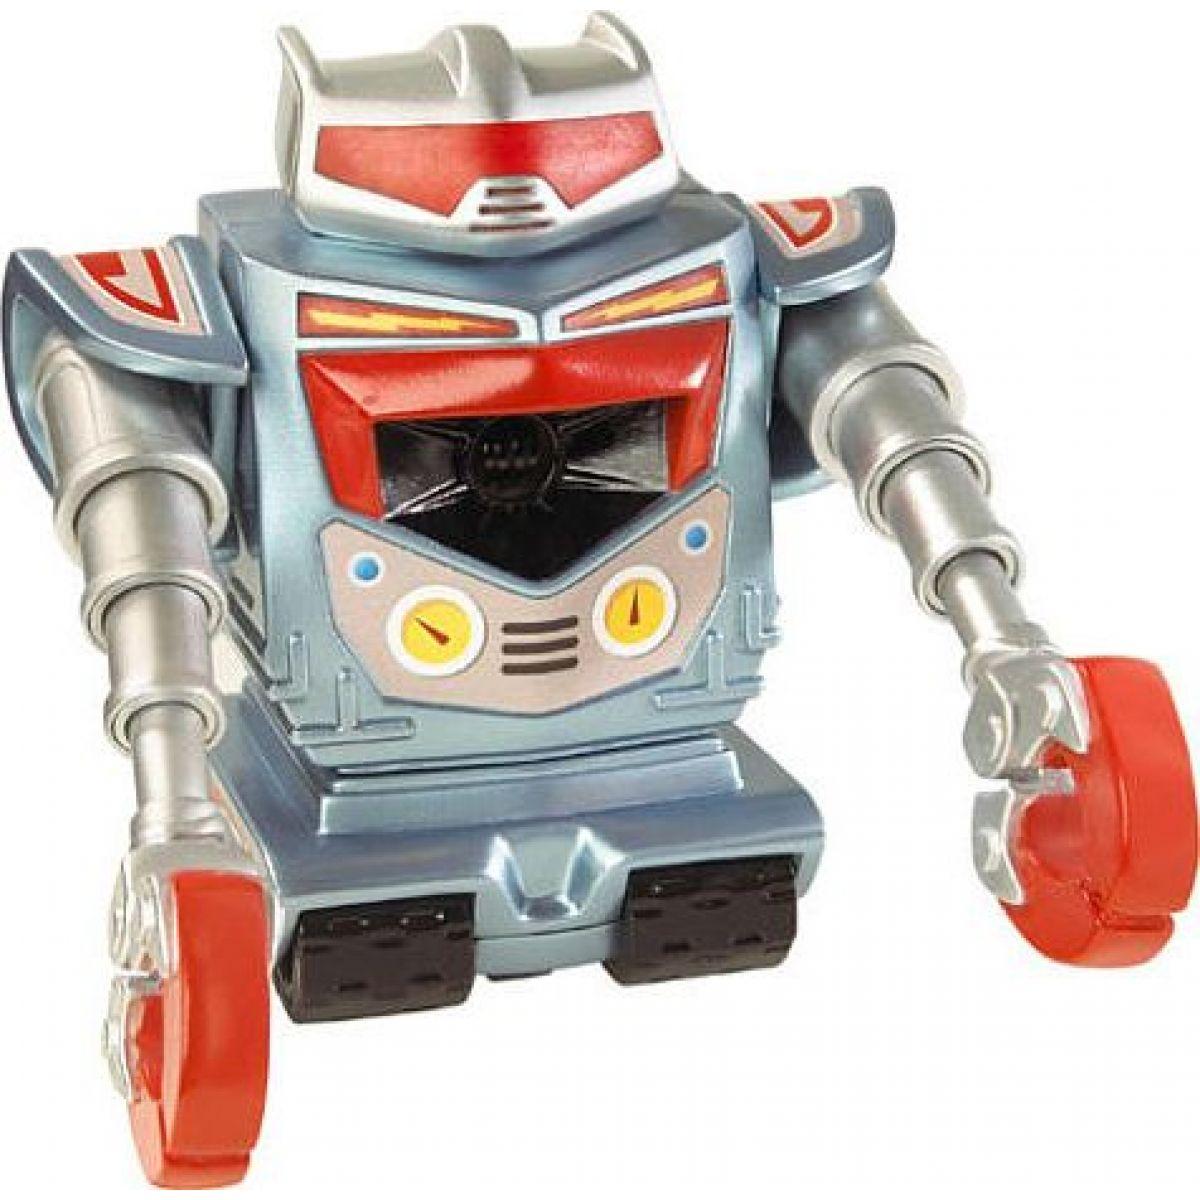 Mattel Sparks Toy Story 3